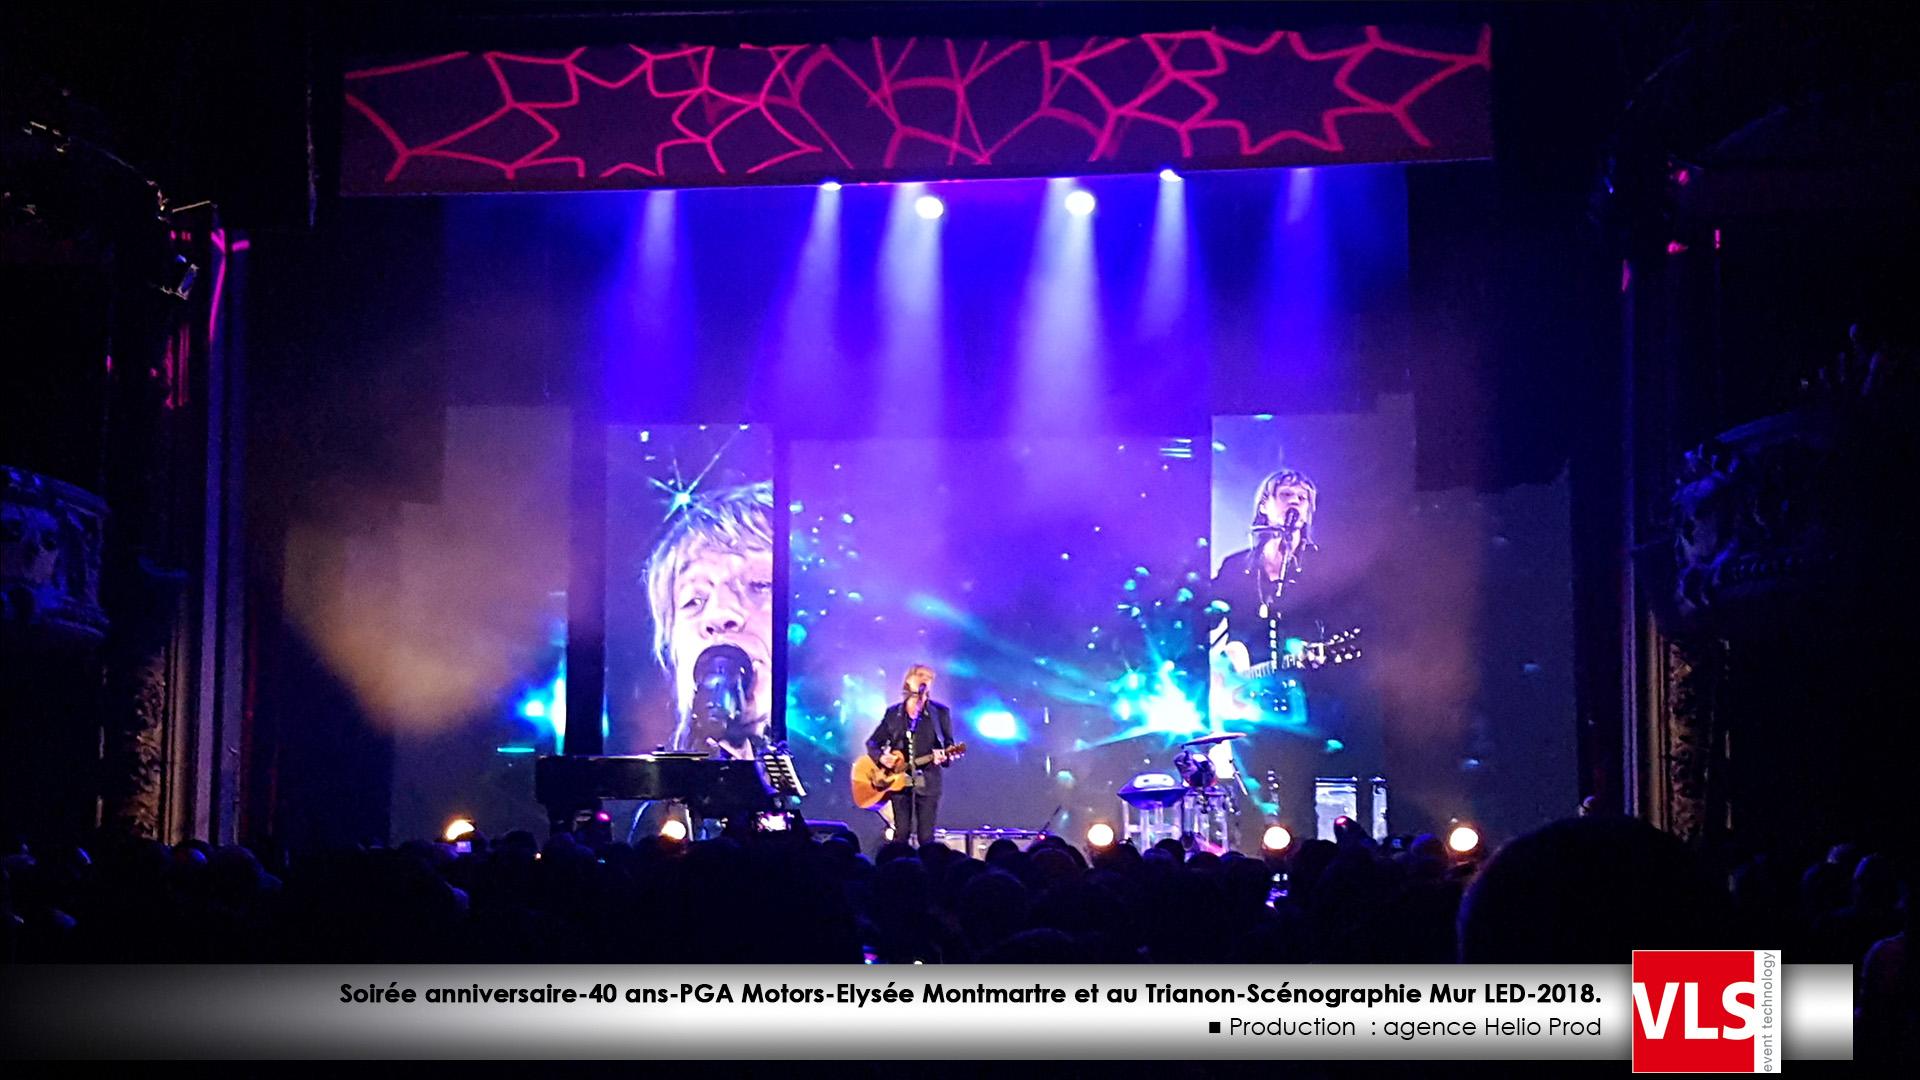 LED scénographie concert